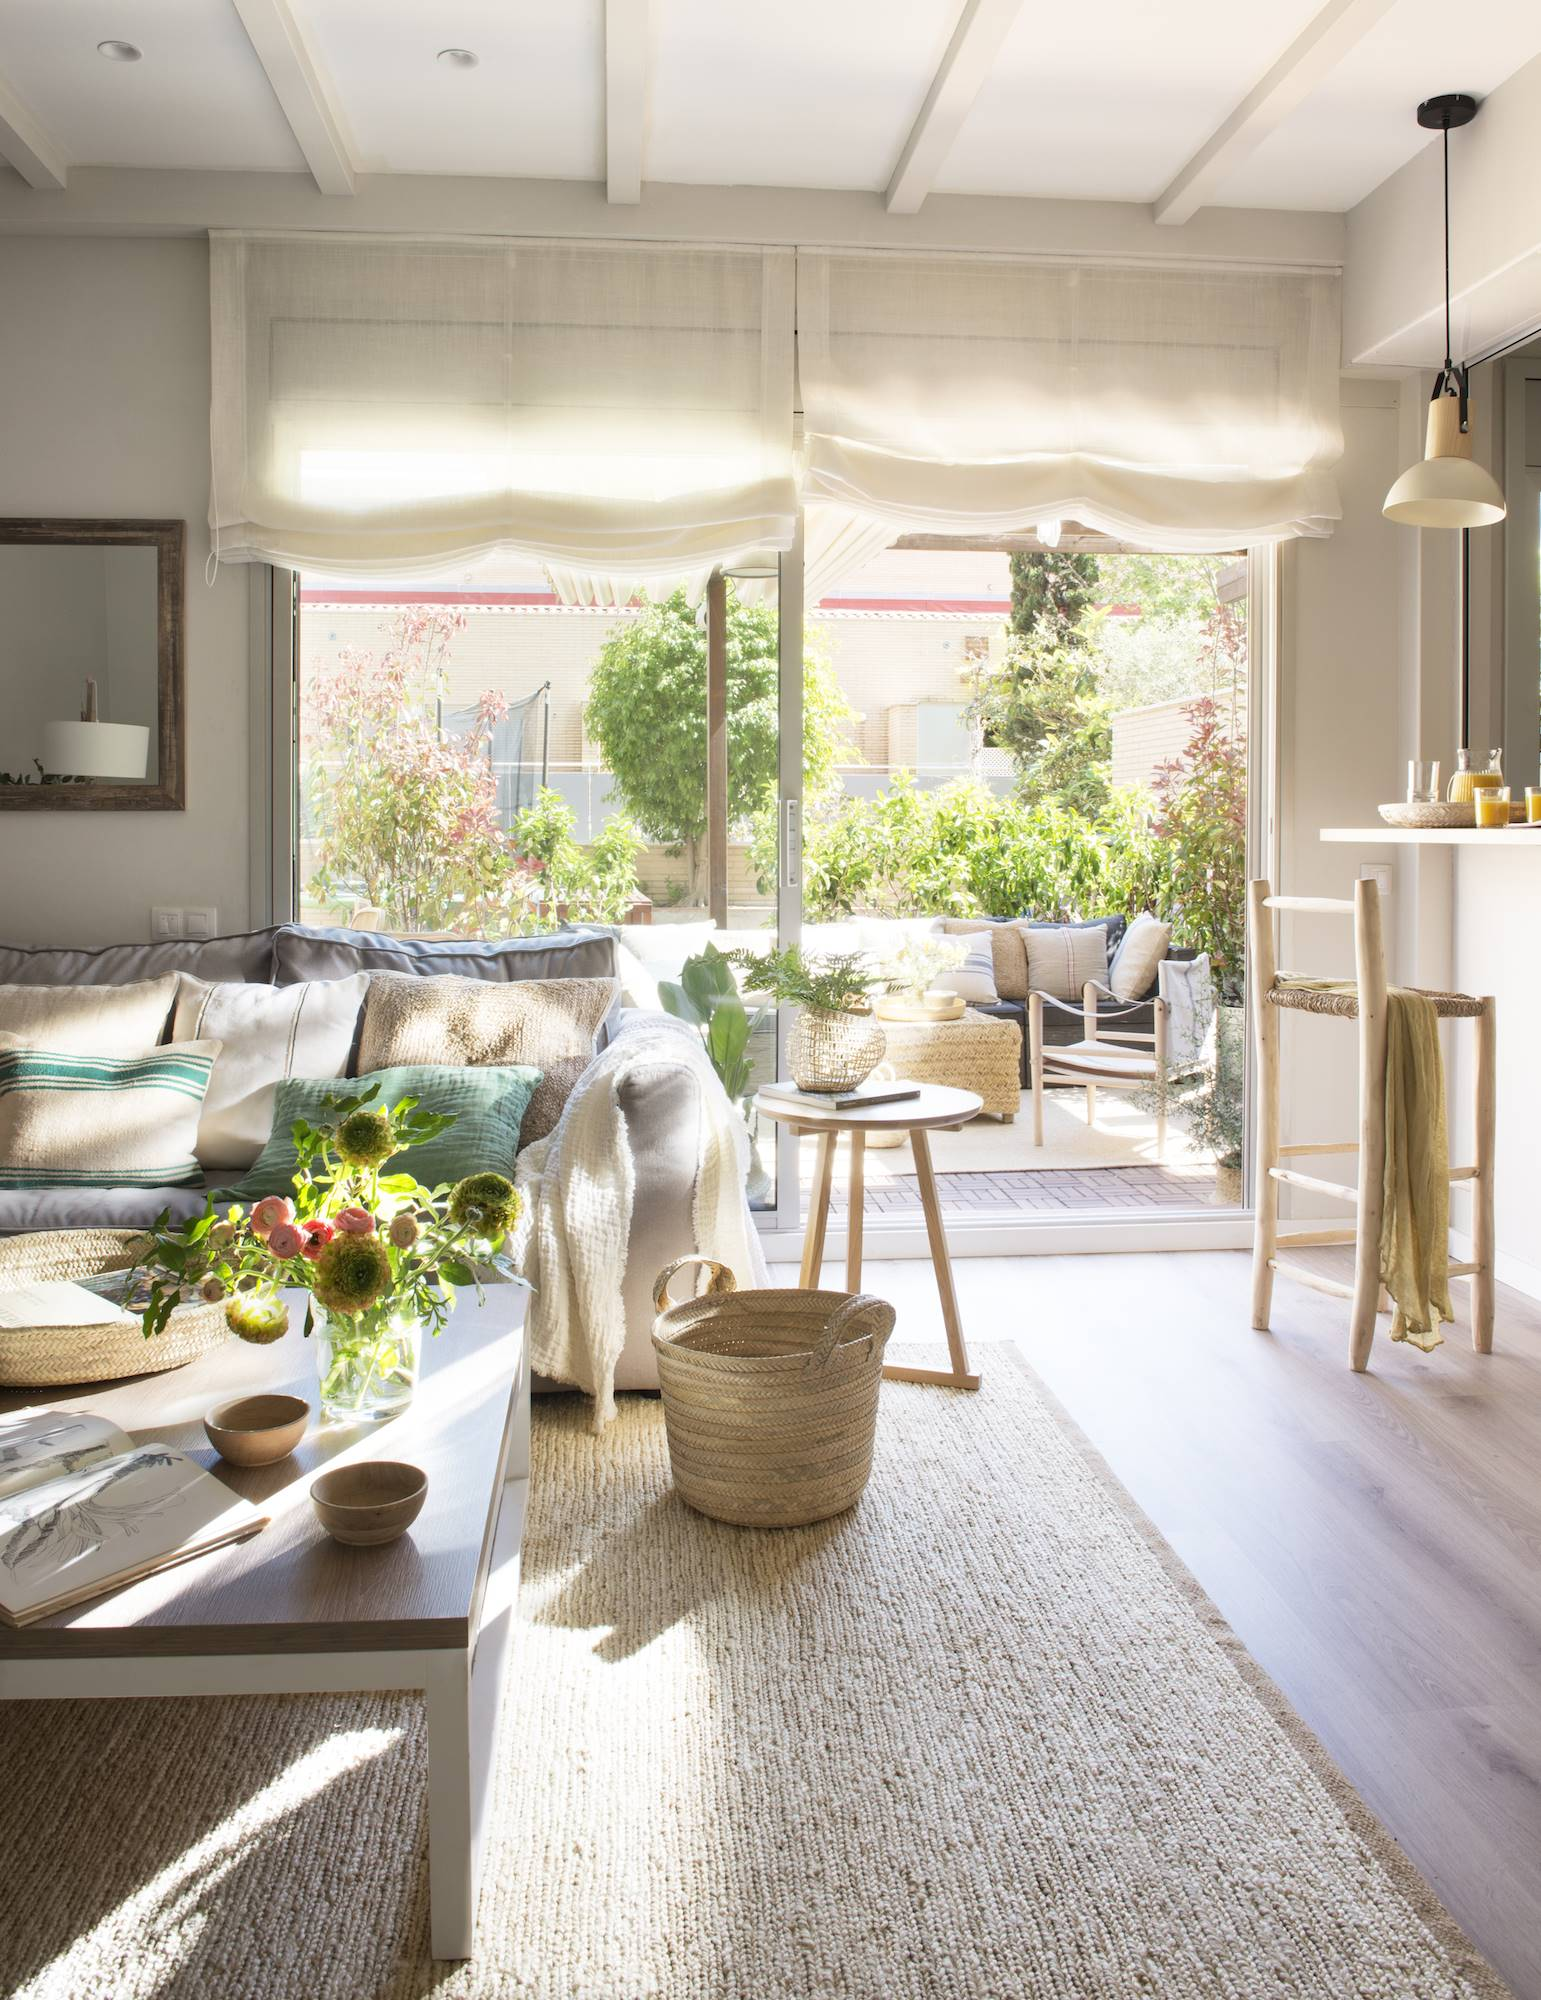 65 Trucos Para Iluminar Mejor Tu Casa